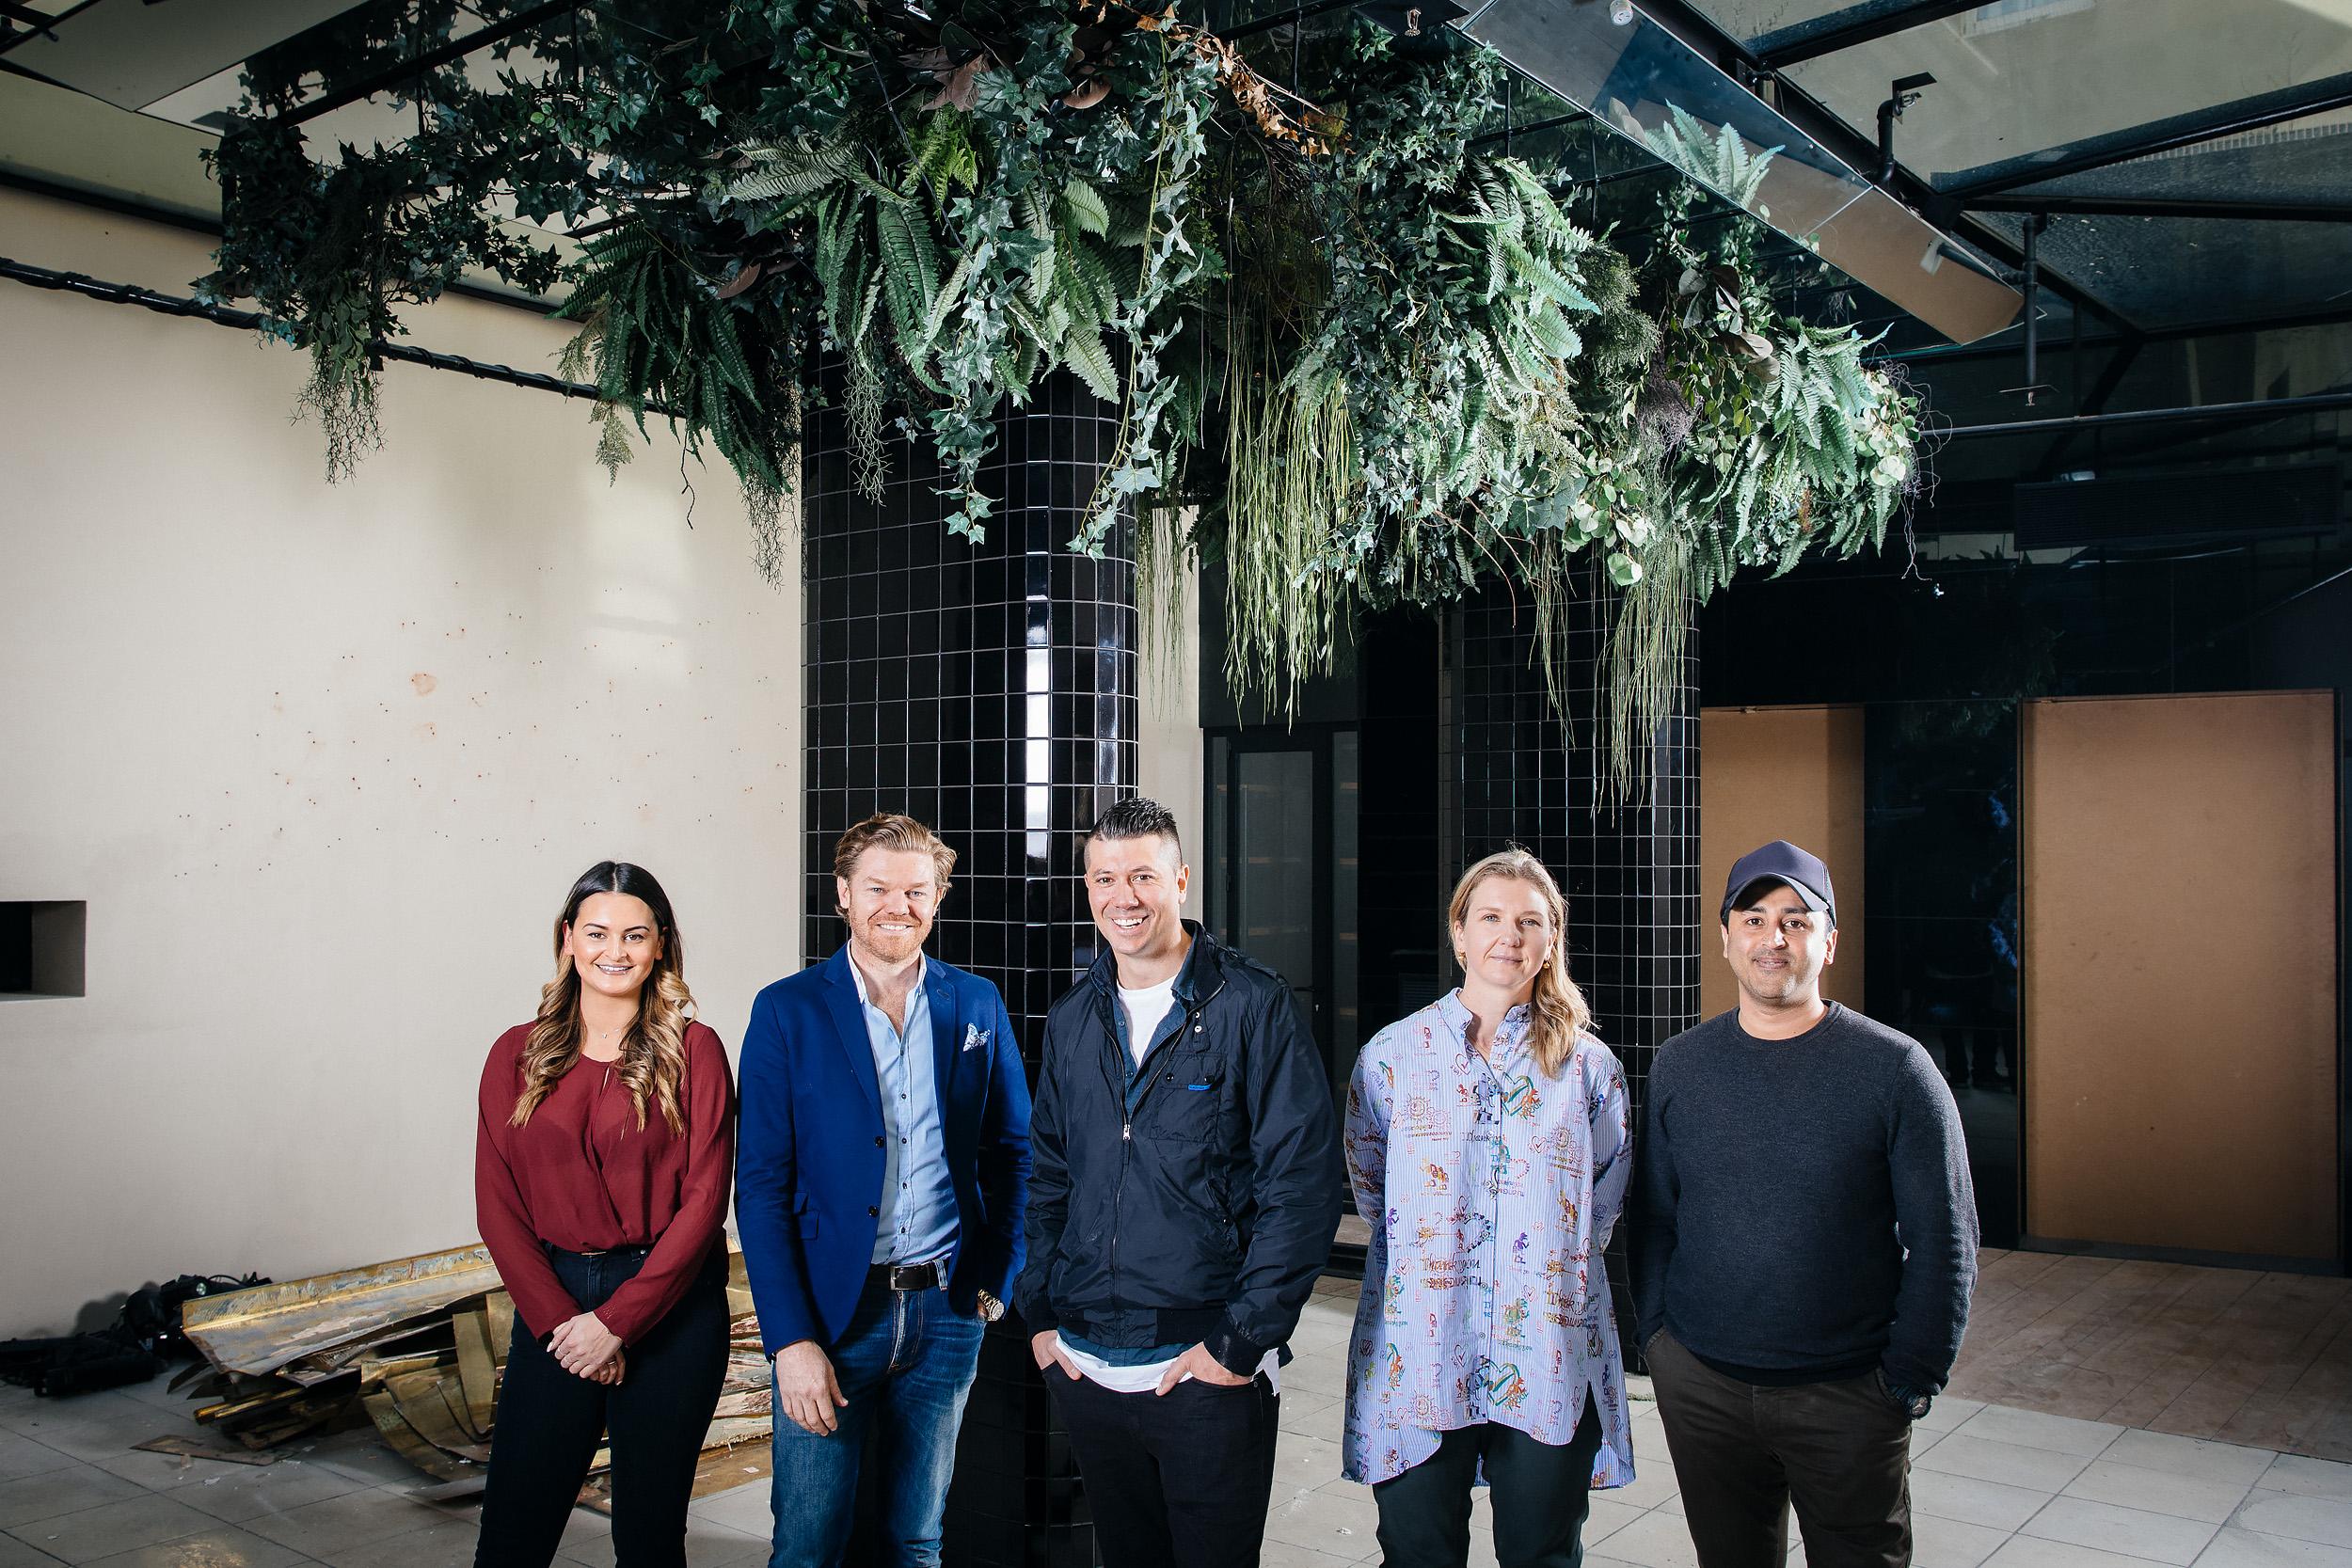 Jess Harker, Andrew Ryan, Dan Hawkins, Iva Foschia and Reg Lodewyke